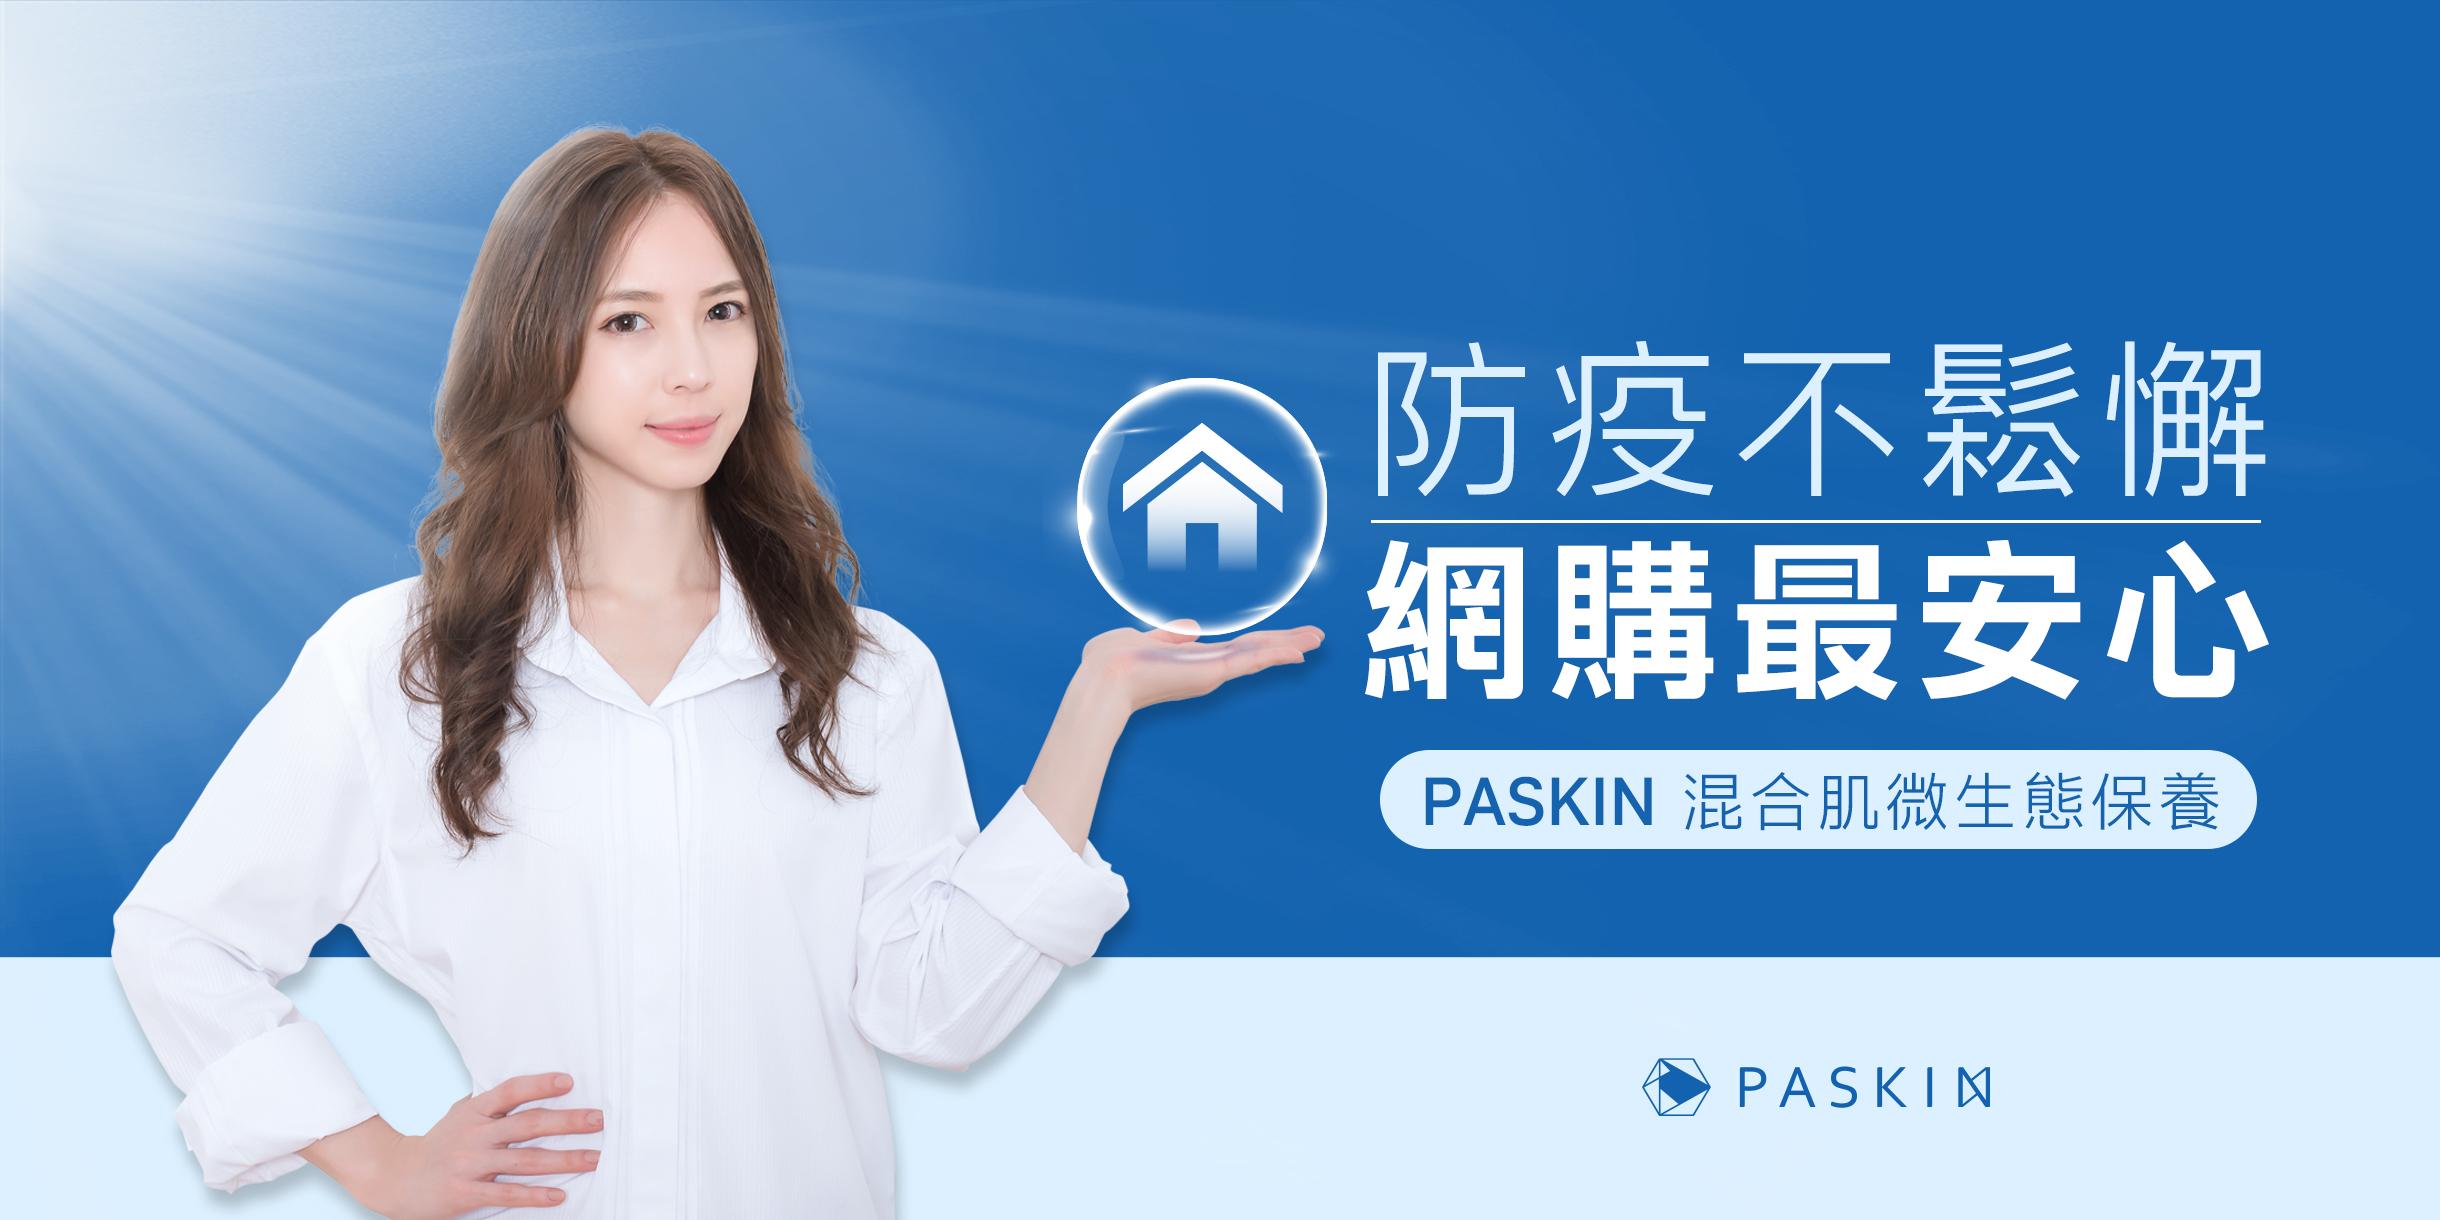 Paskin防疫不鬆懈 網購最安心